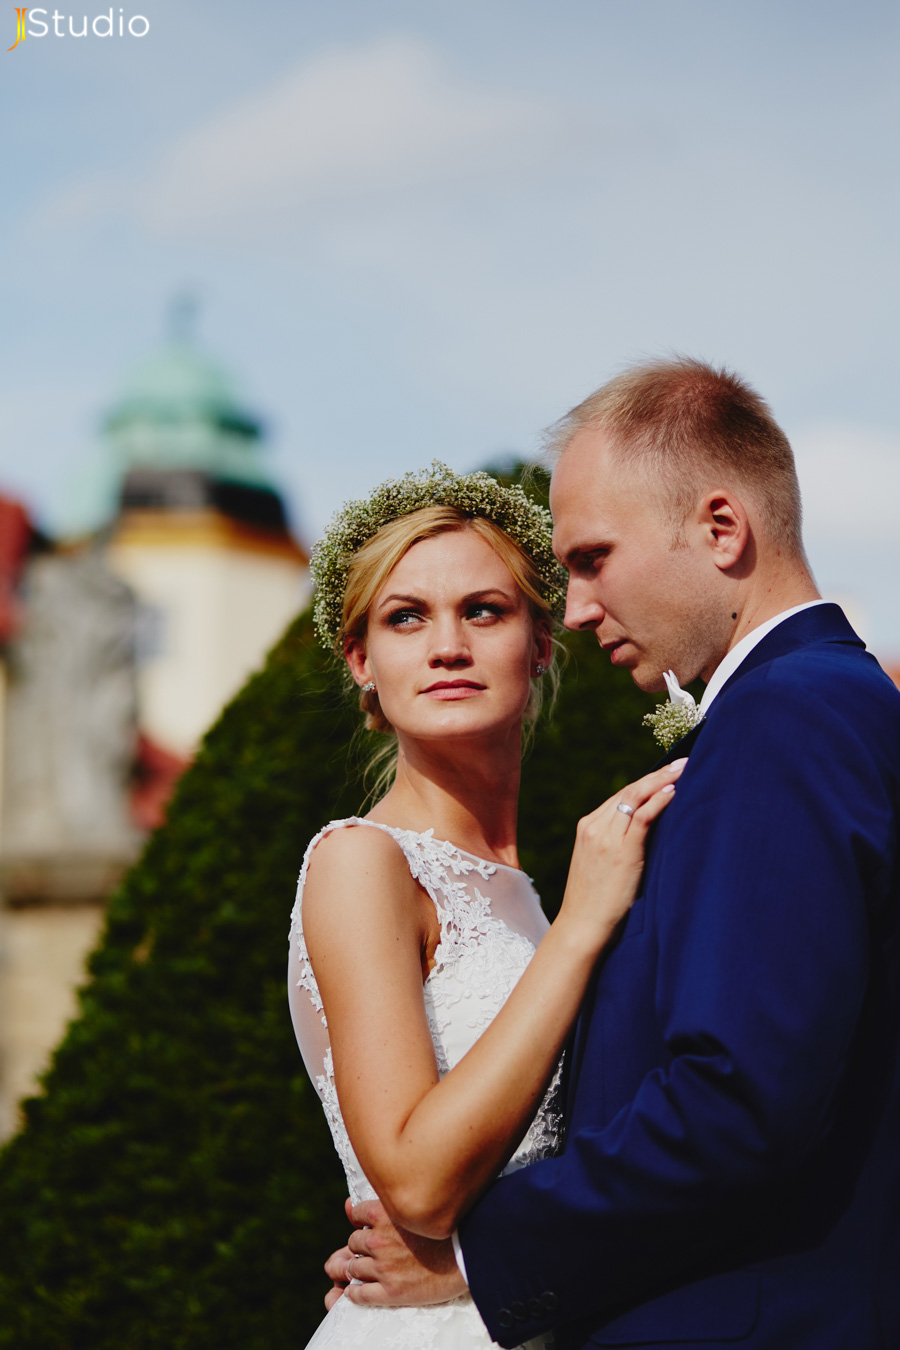 sesja-karpacz-jstudio-net-pl-blog-30-of-35